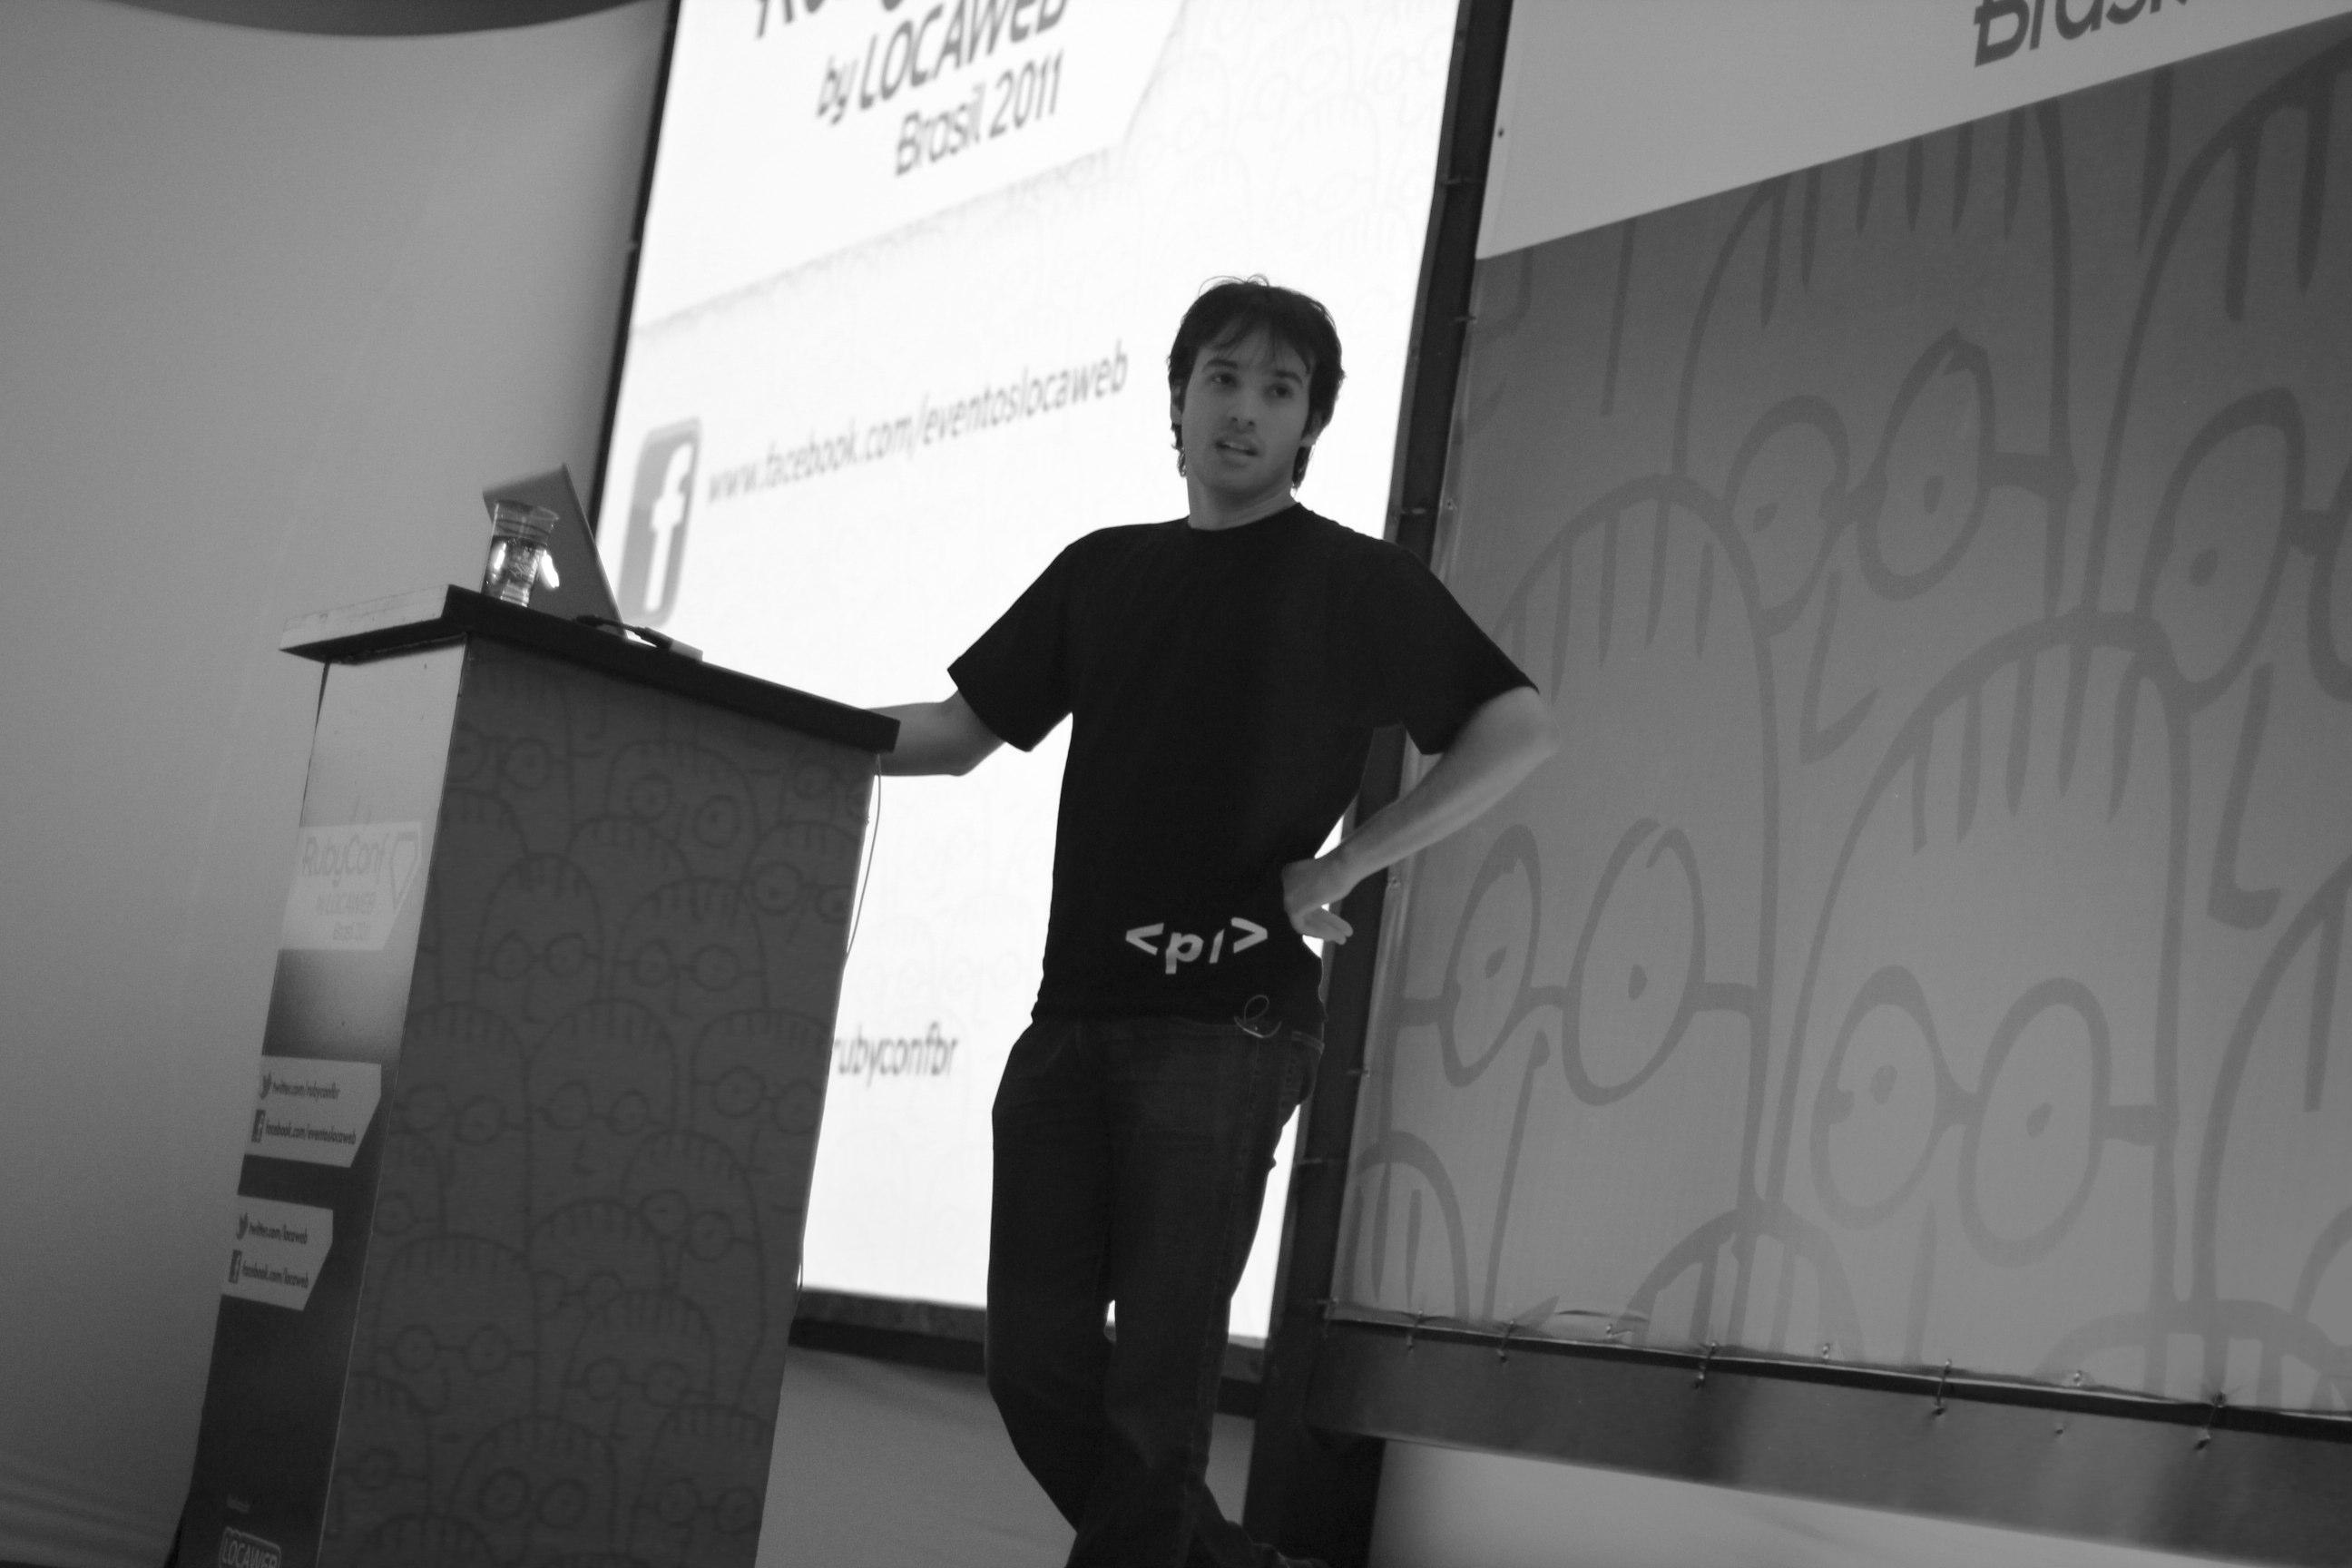 Elixir creator José Valim during a talk in Brazil in 2011.